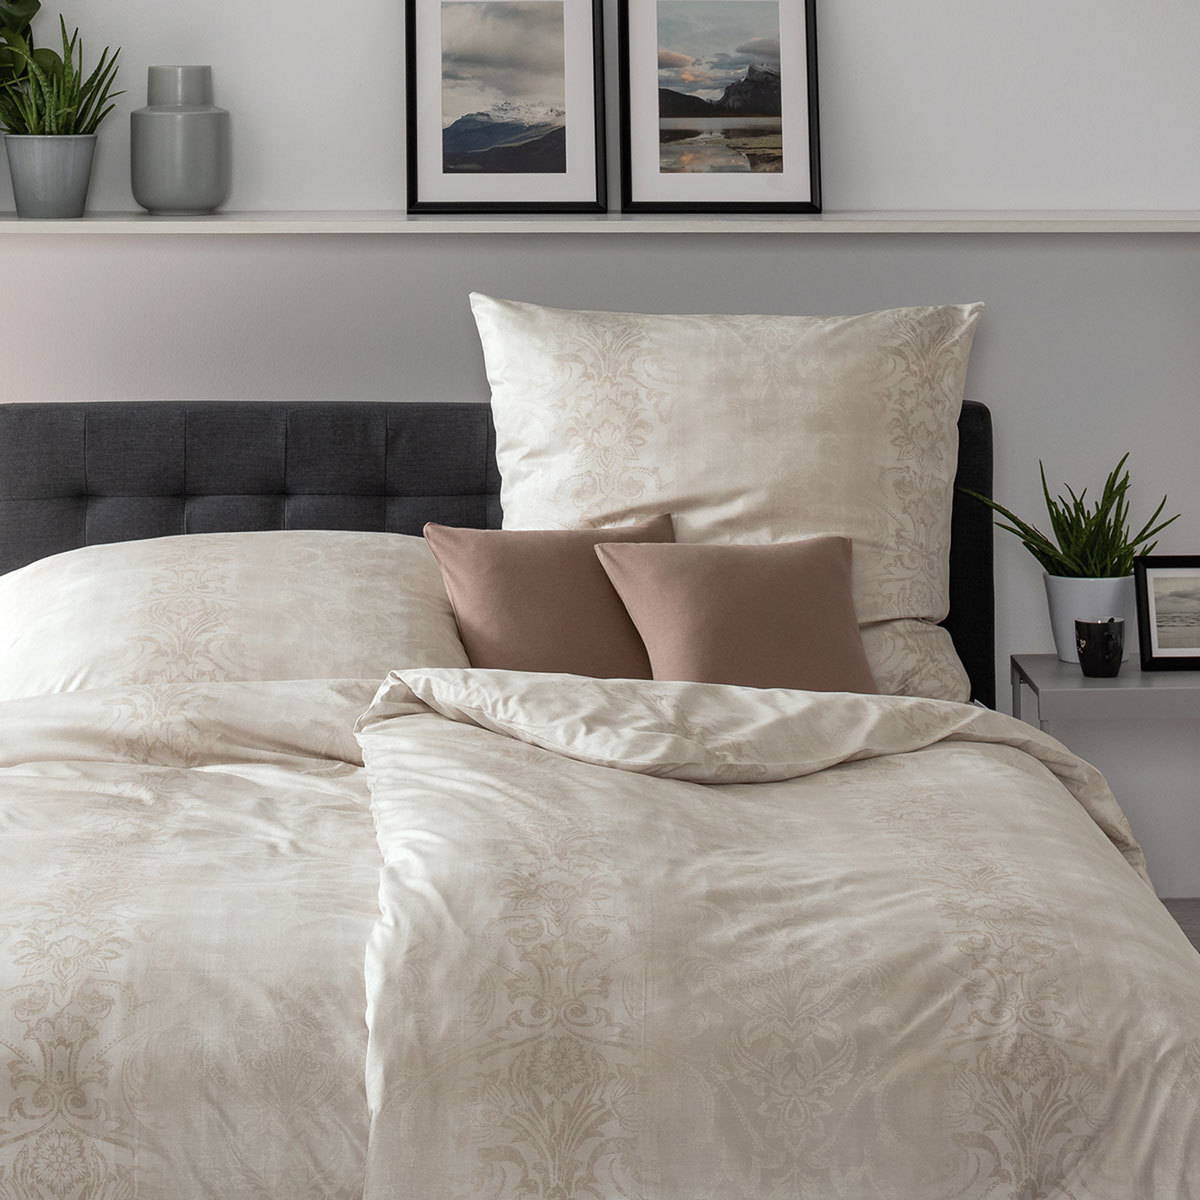 estella mako interlock jersey bettw sche elise creme. Black Bedroom Furniture Sets. Home Design Ideas